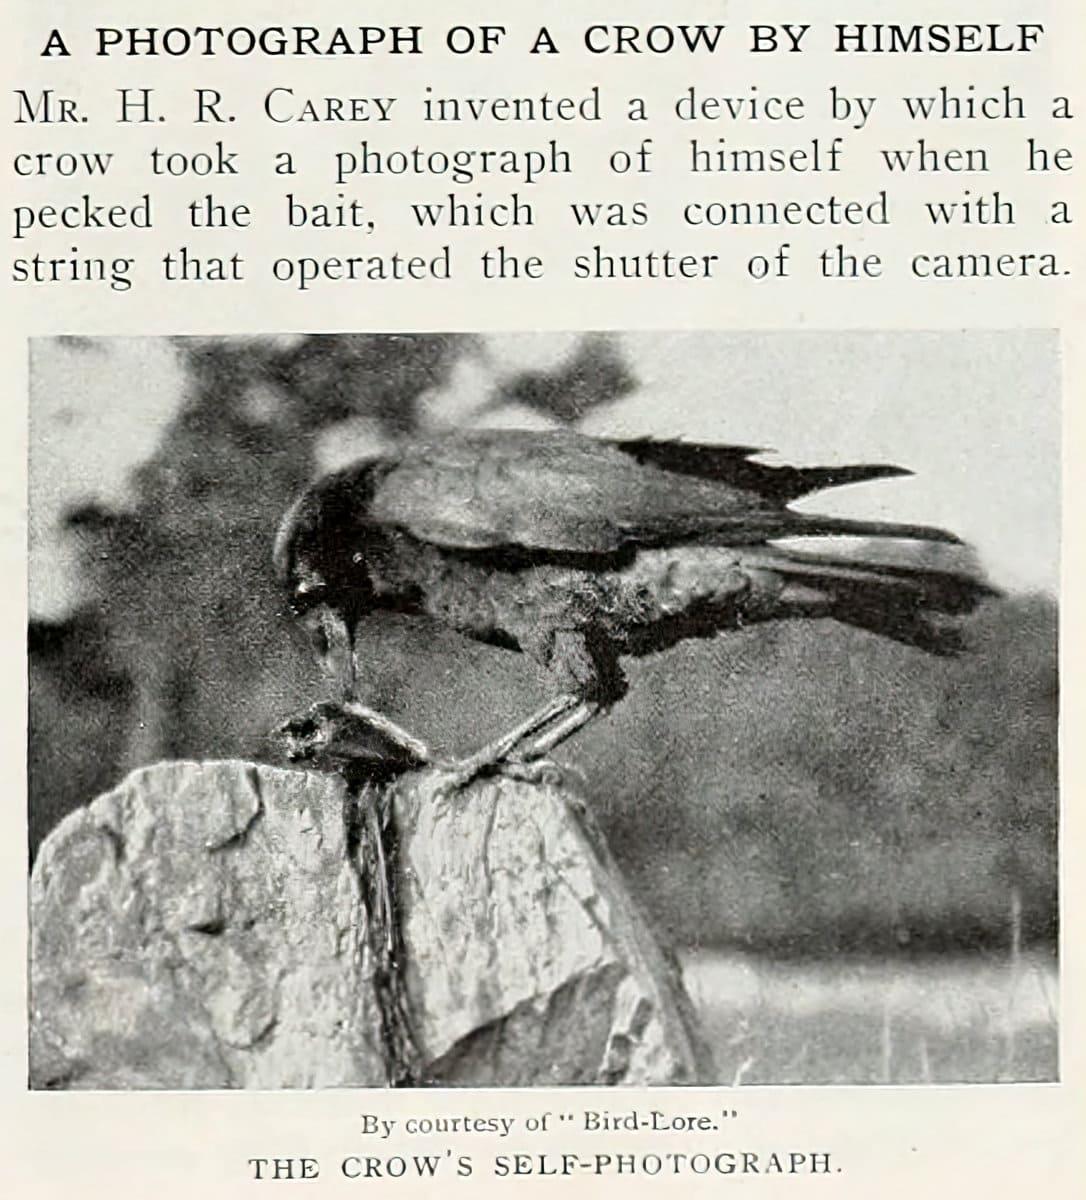 Vintage crow selfie from 1912 at ClickAmericana com